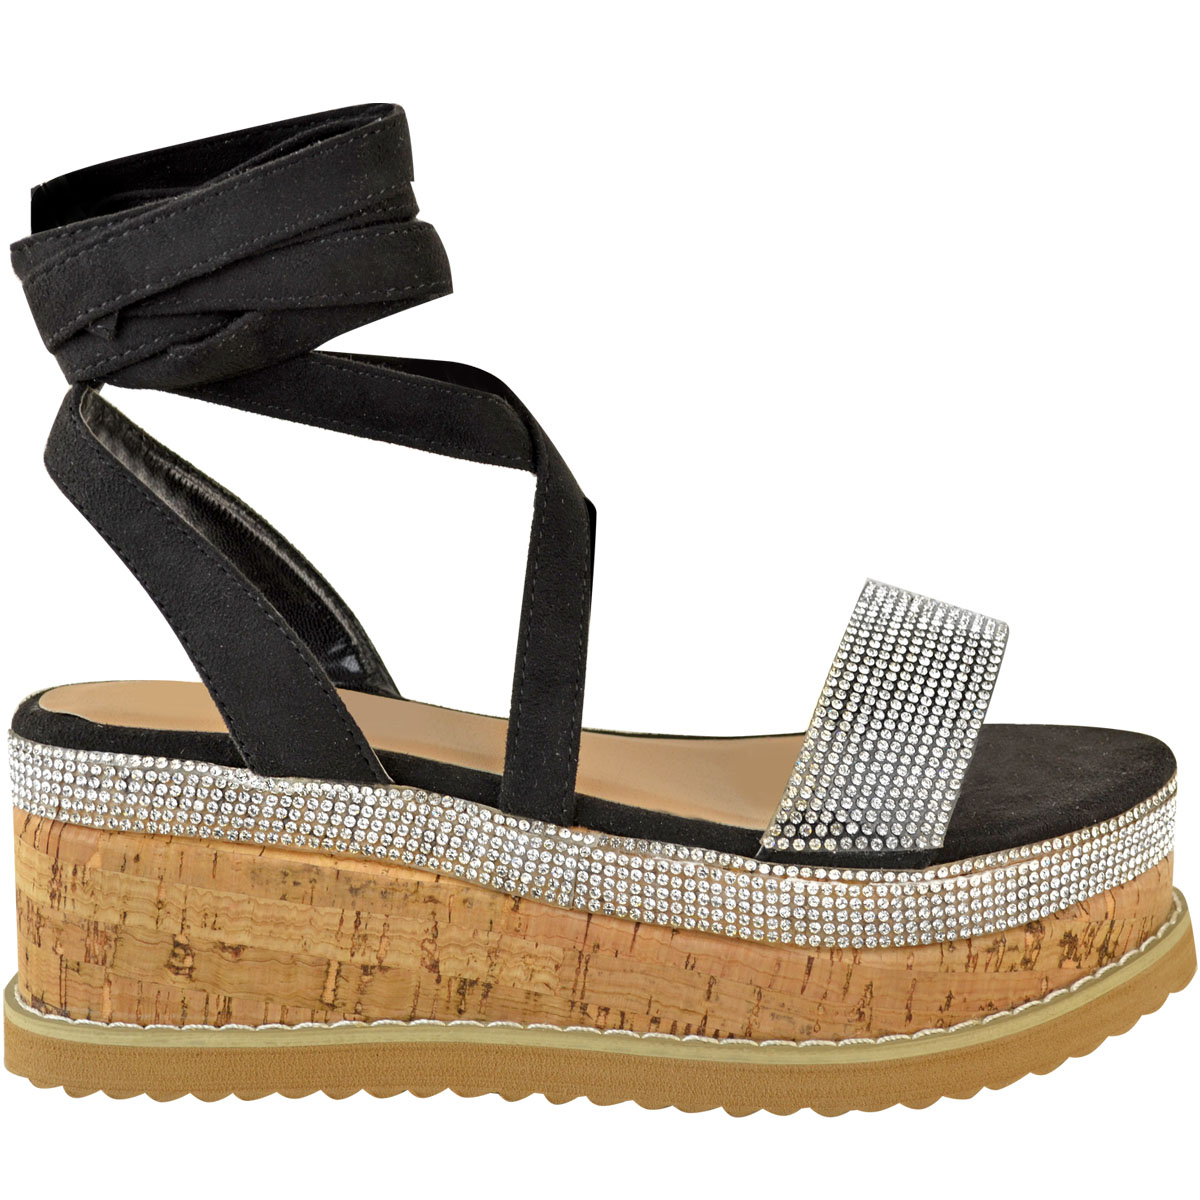 Womens-Ladies-Flatform-Diamante-Wedge-Sandals-Platform-Ankle-Lace-Up-Summer-Size thumbnail 4